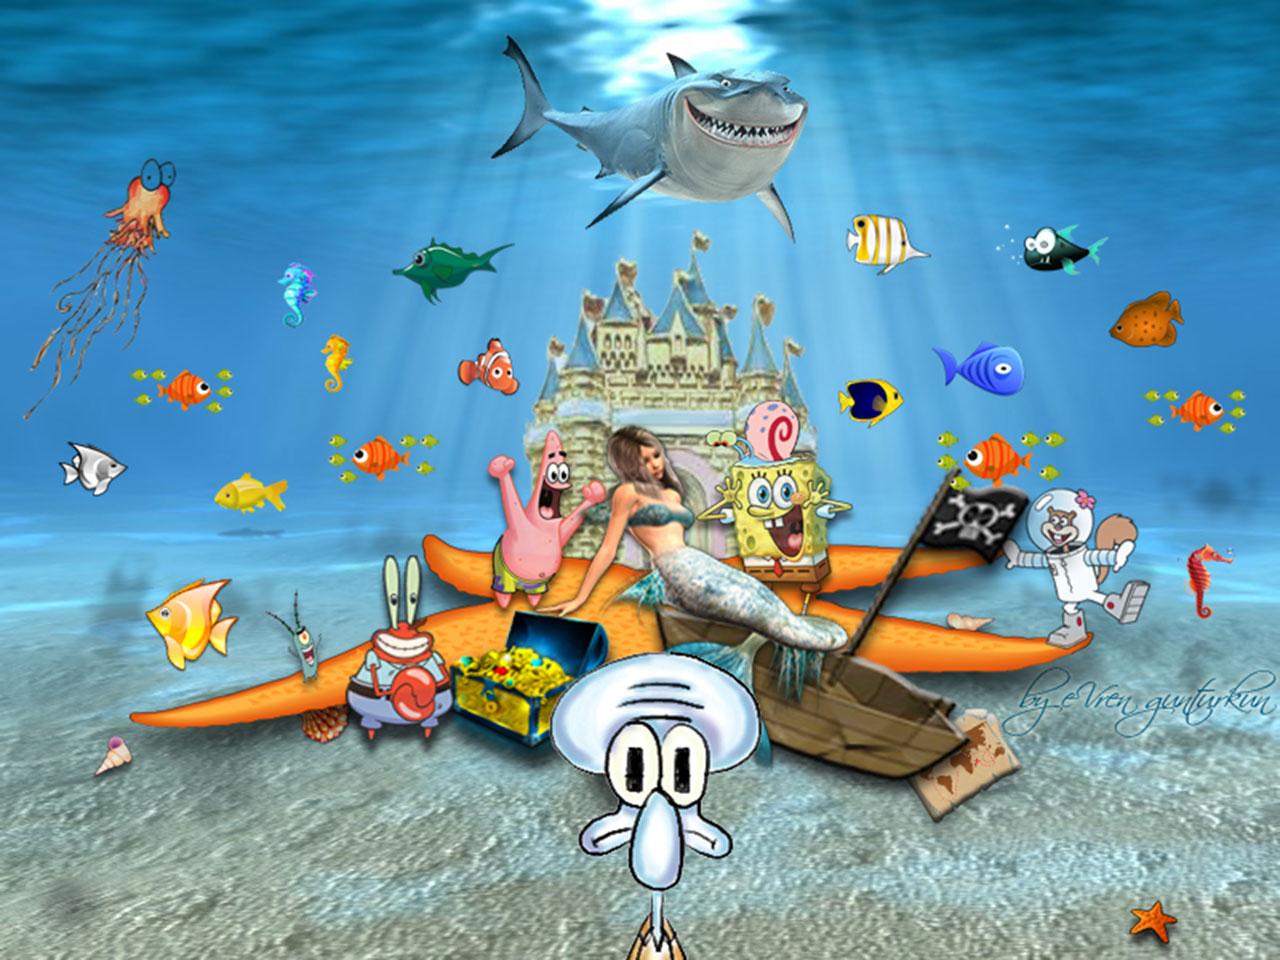 spongebob squarepants characters wallpaper picture spongebob